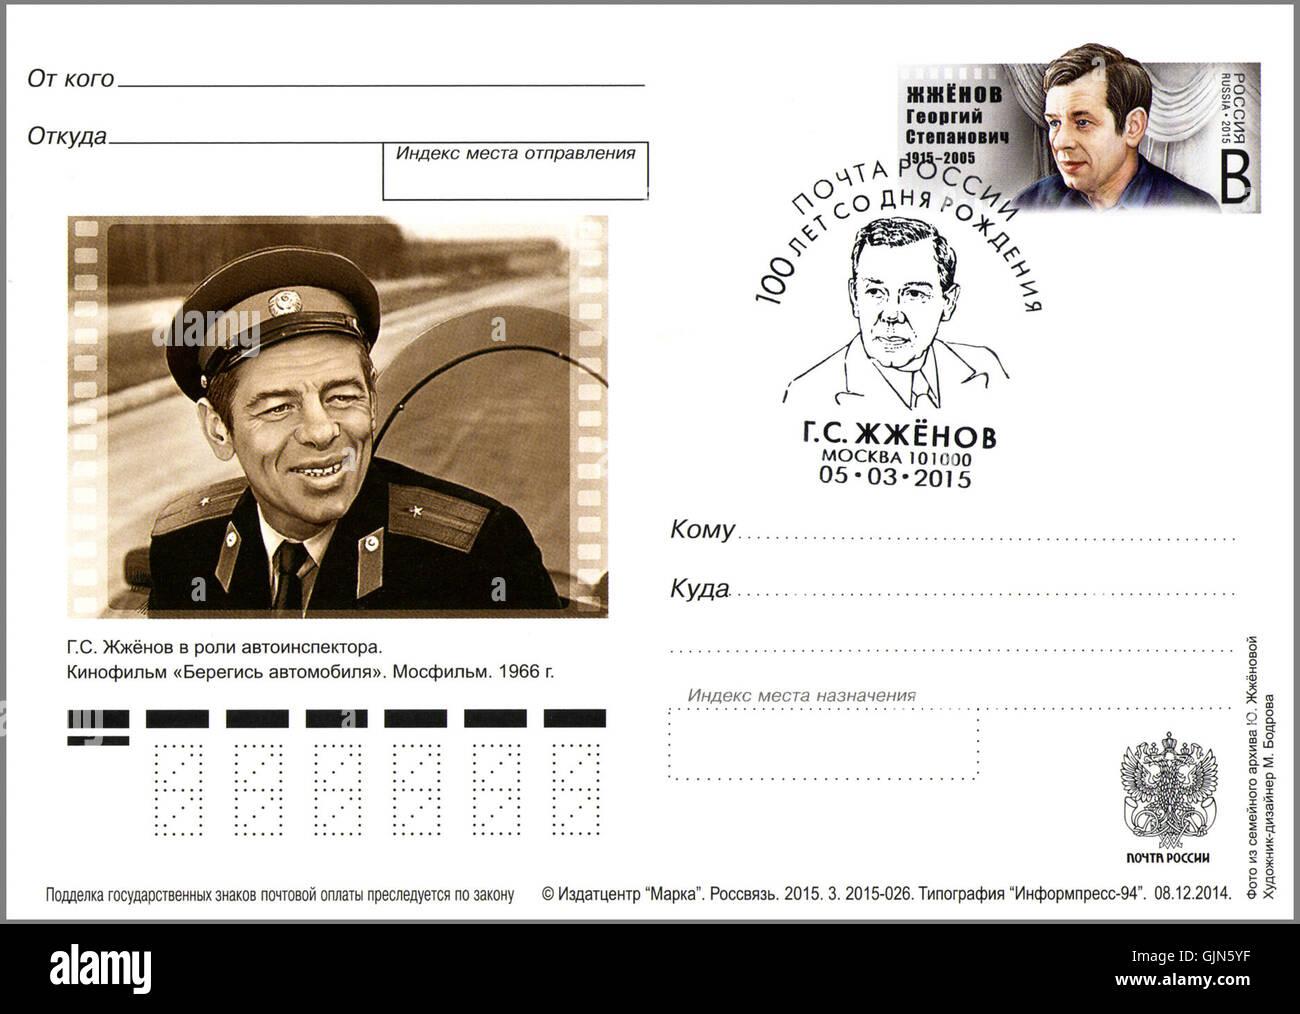 Georgy Zhzhonov Postal card Russia 2015 - Stock Image